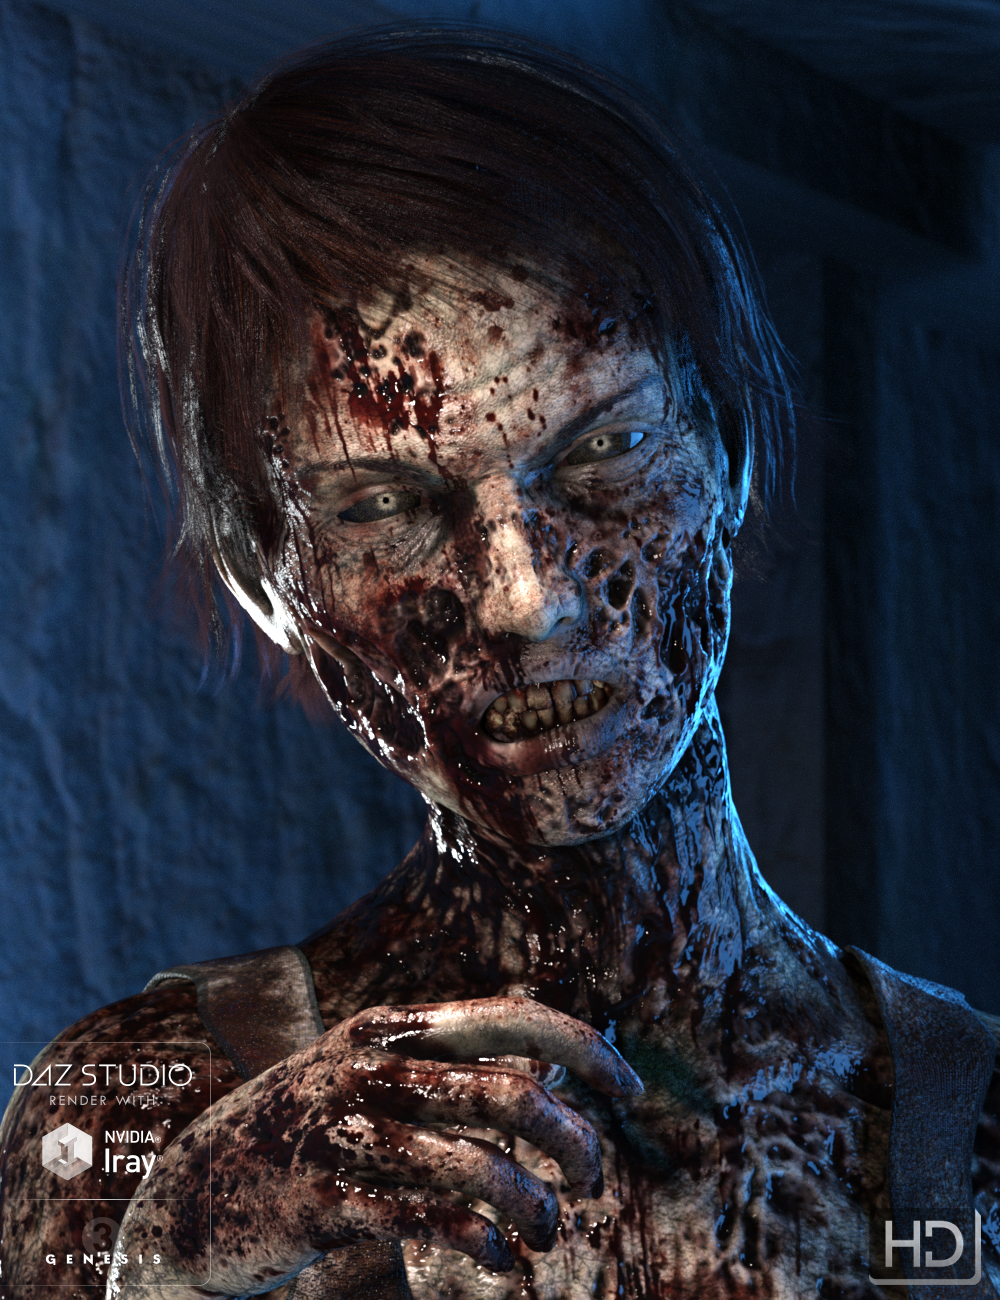 Ultimate Zombie HD for Genesis 3 Female by: Groovy Patrol, 3D Models by Daz 3D